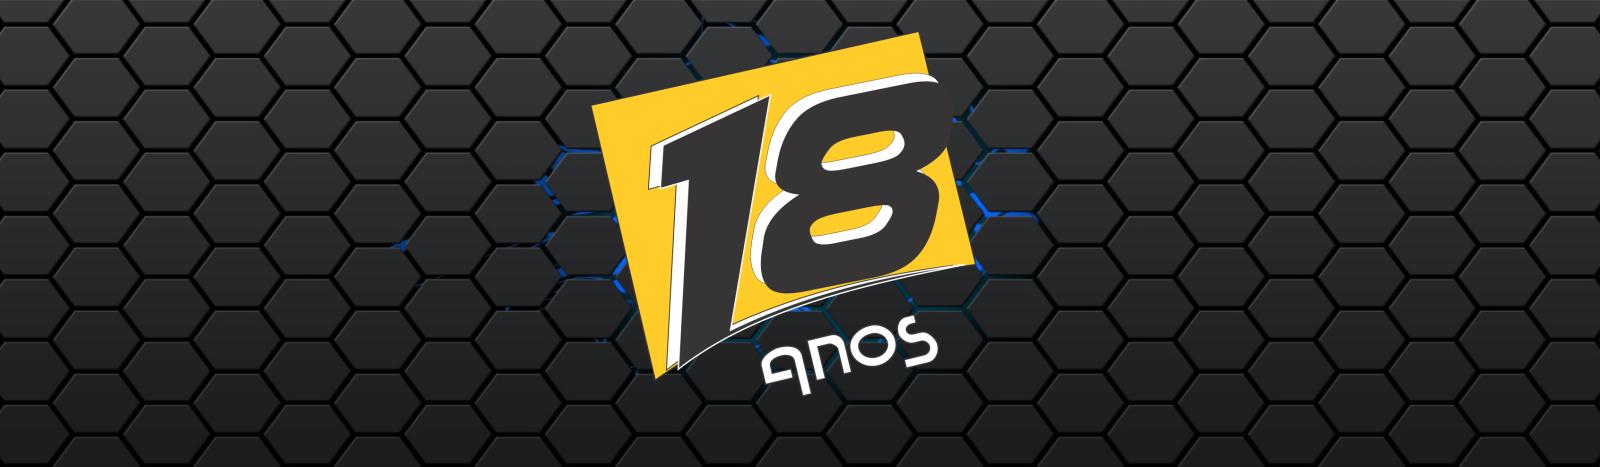 18ANOS SPYDER